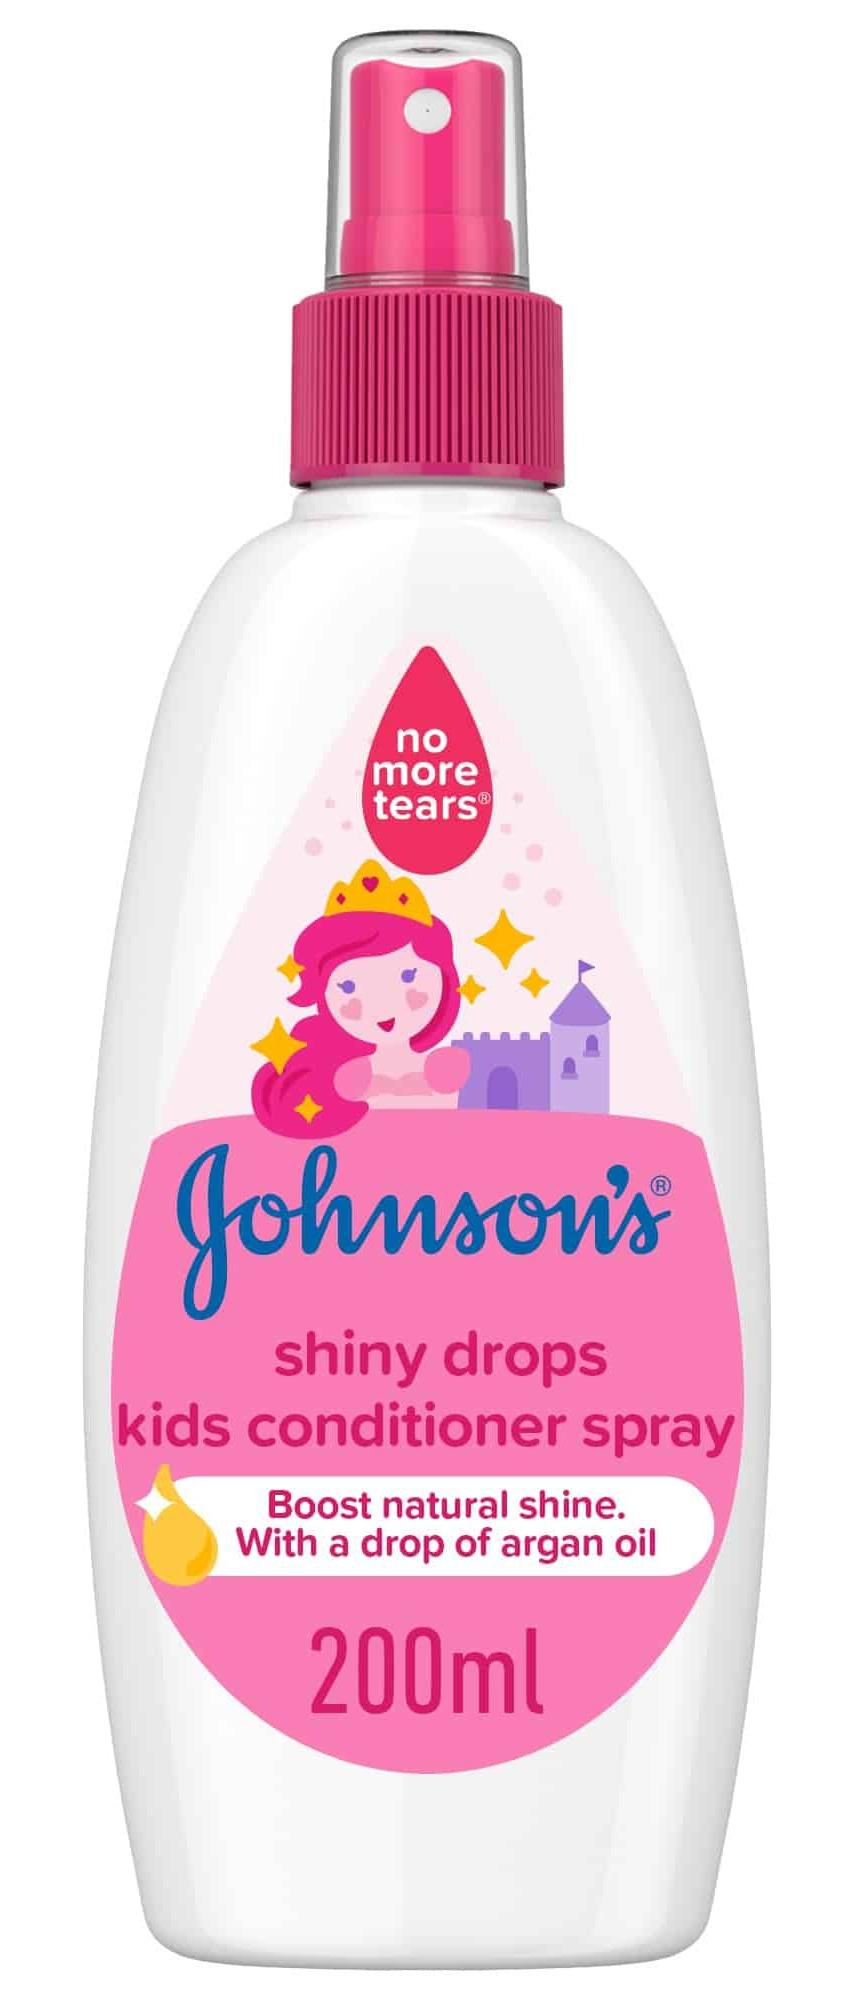 Johnson and Johnson Johnson Shiny Drops Kids Conditioner Spray